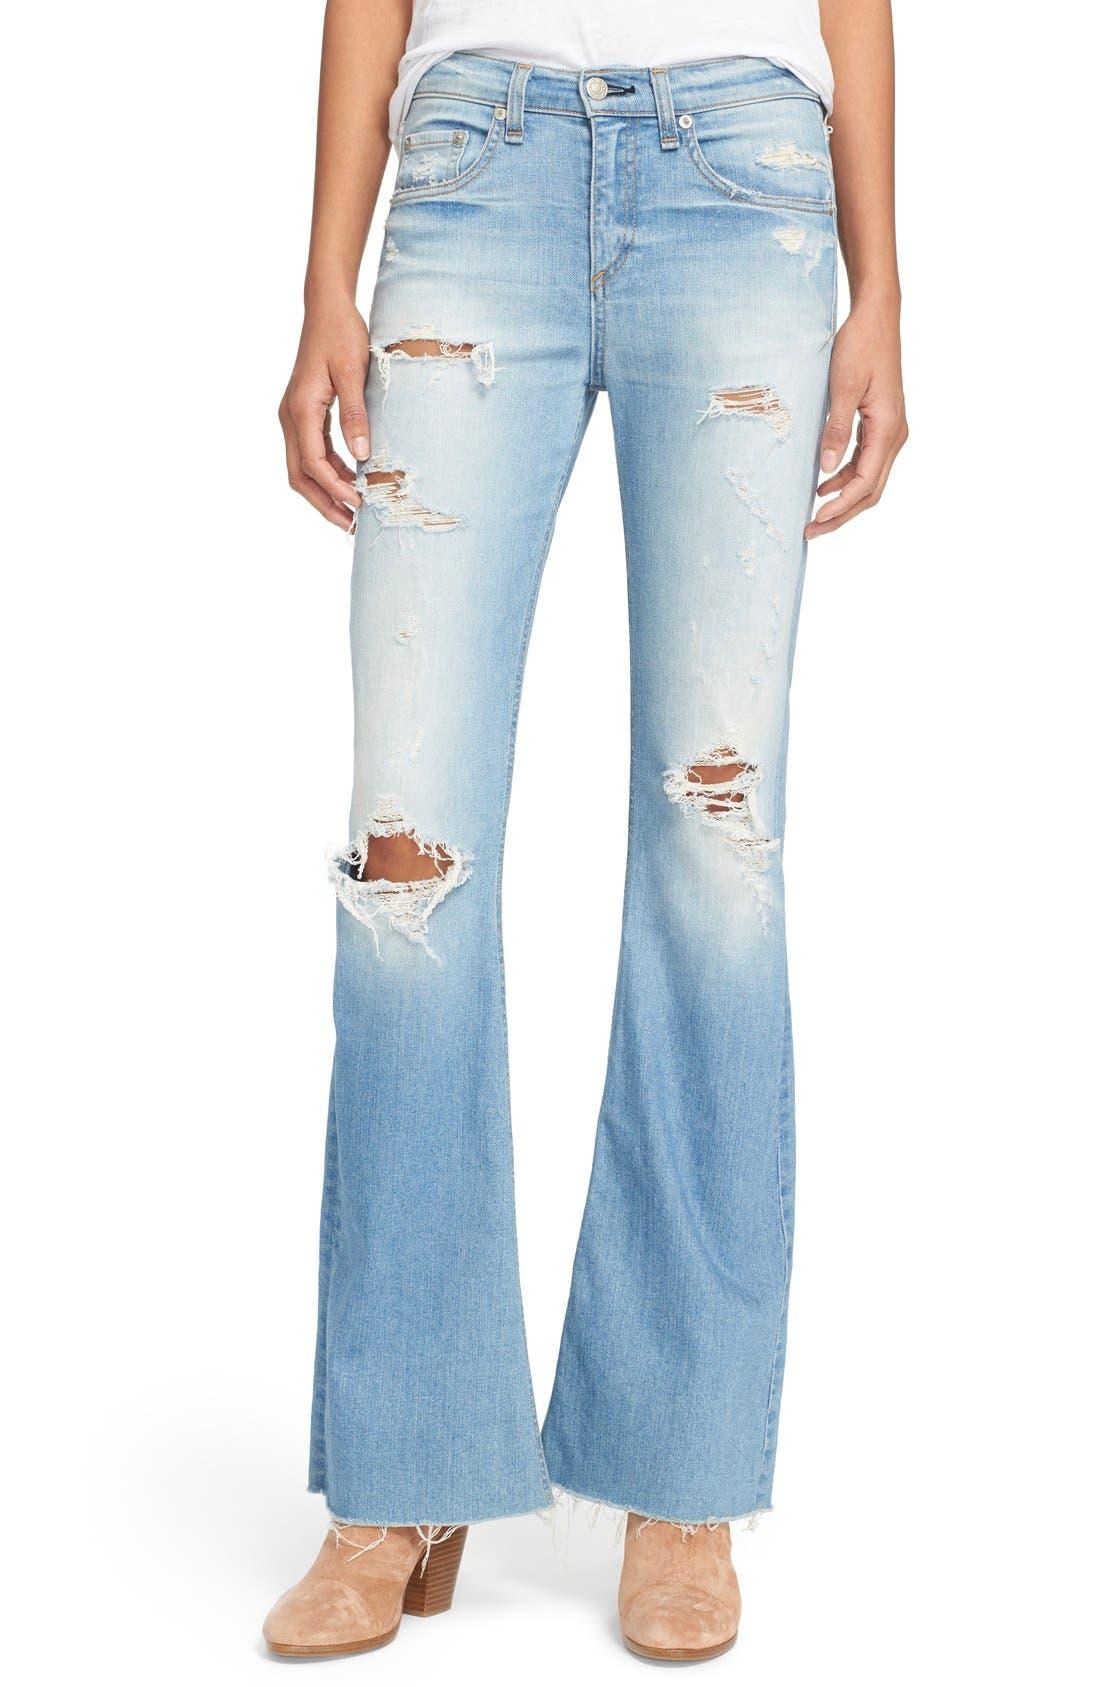 Main Image - rag & bone/JEAN 'Beach' High Rise Bell Bottom Jeans (Ryder)